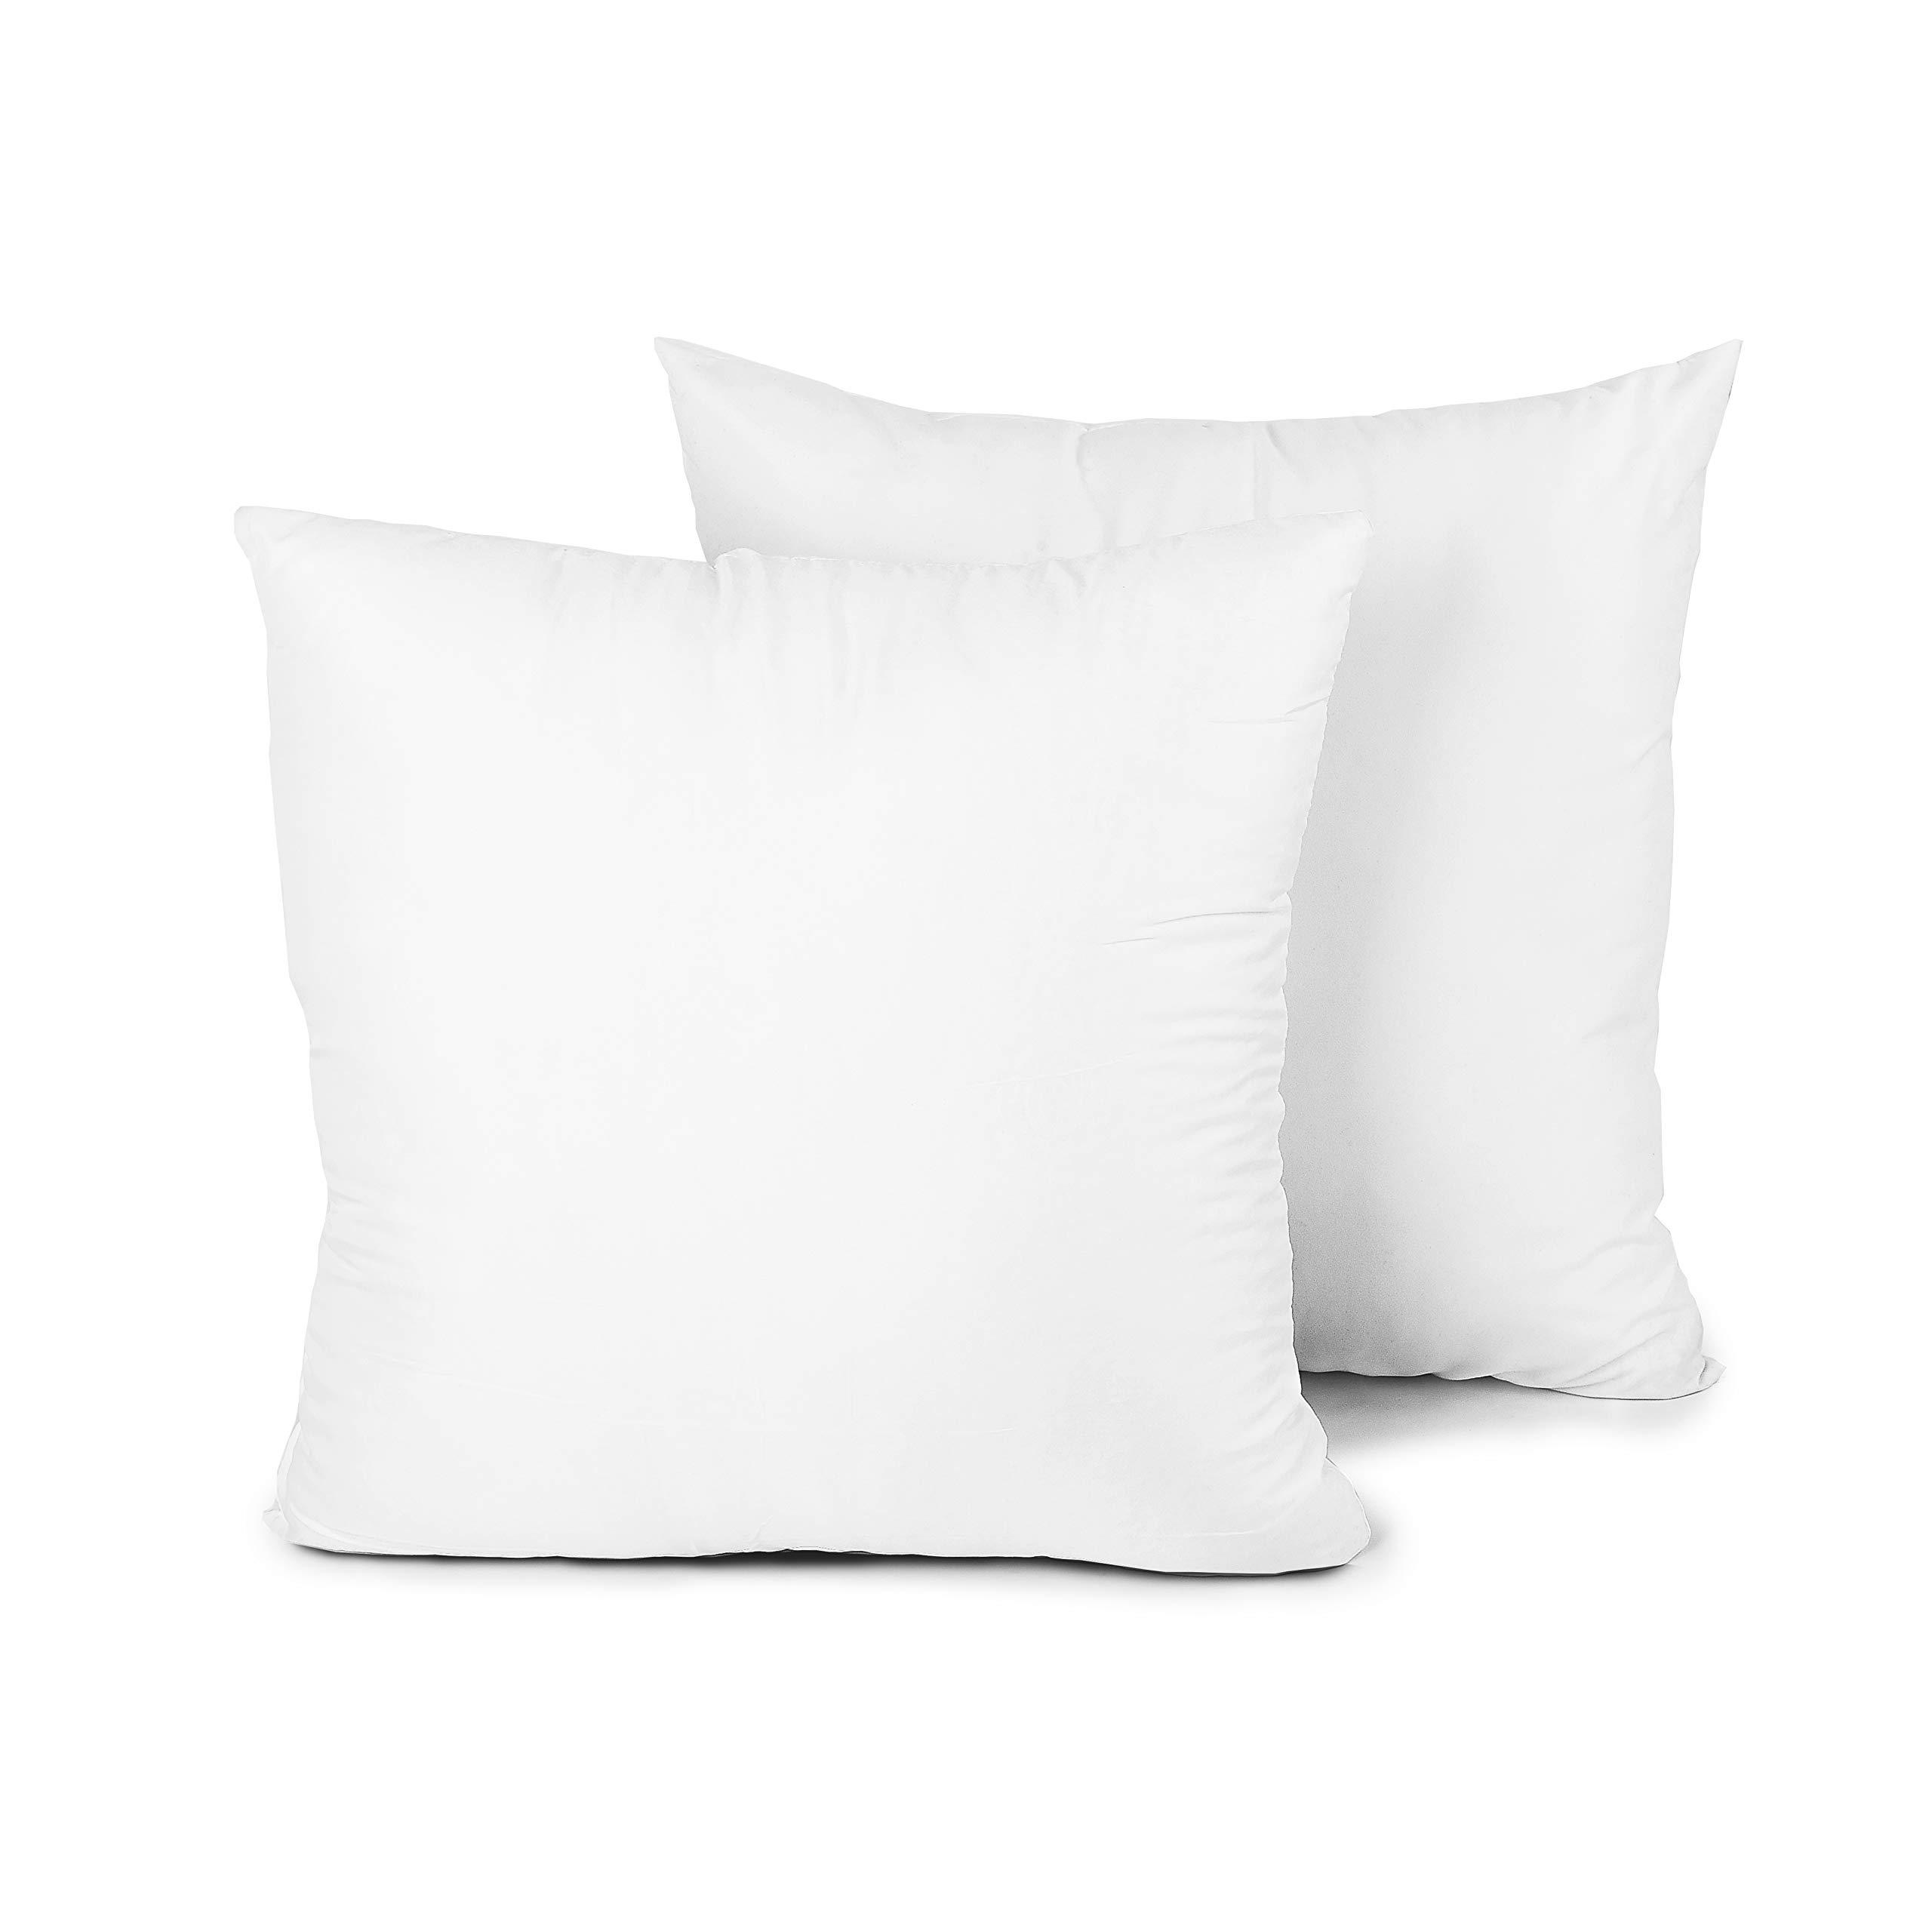 Edow Hypoallergenic Alternative Polyester Decorative